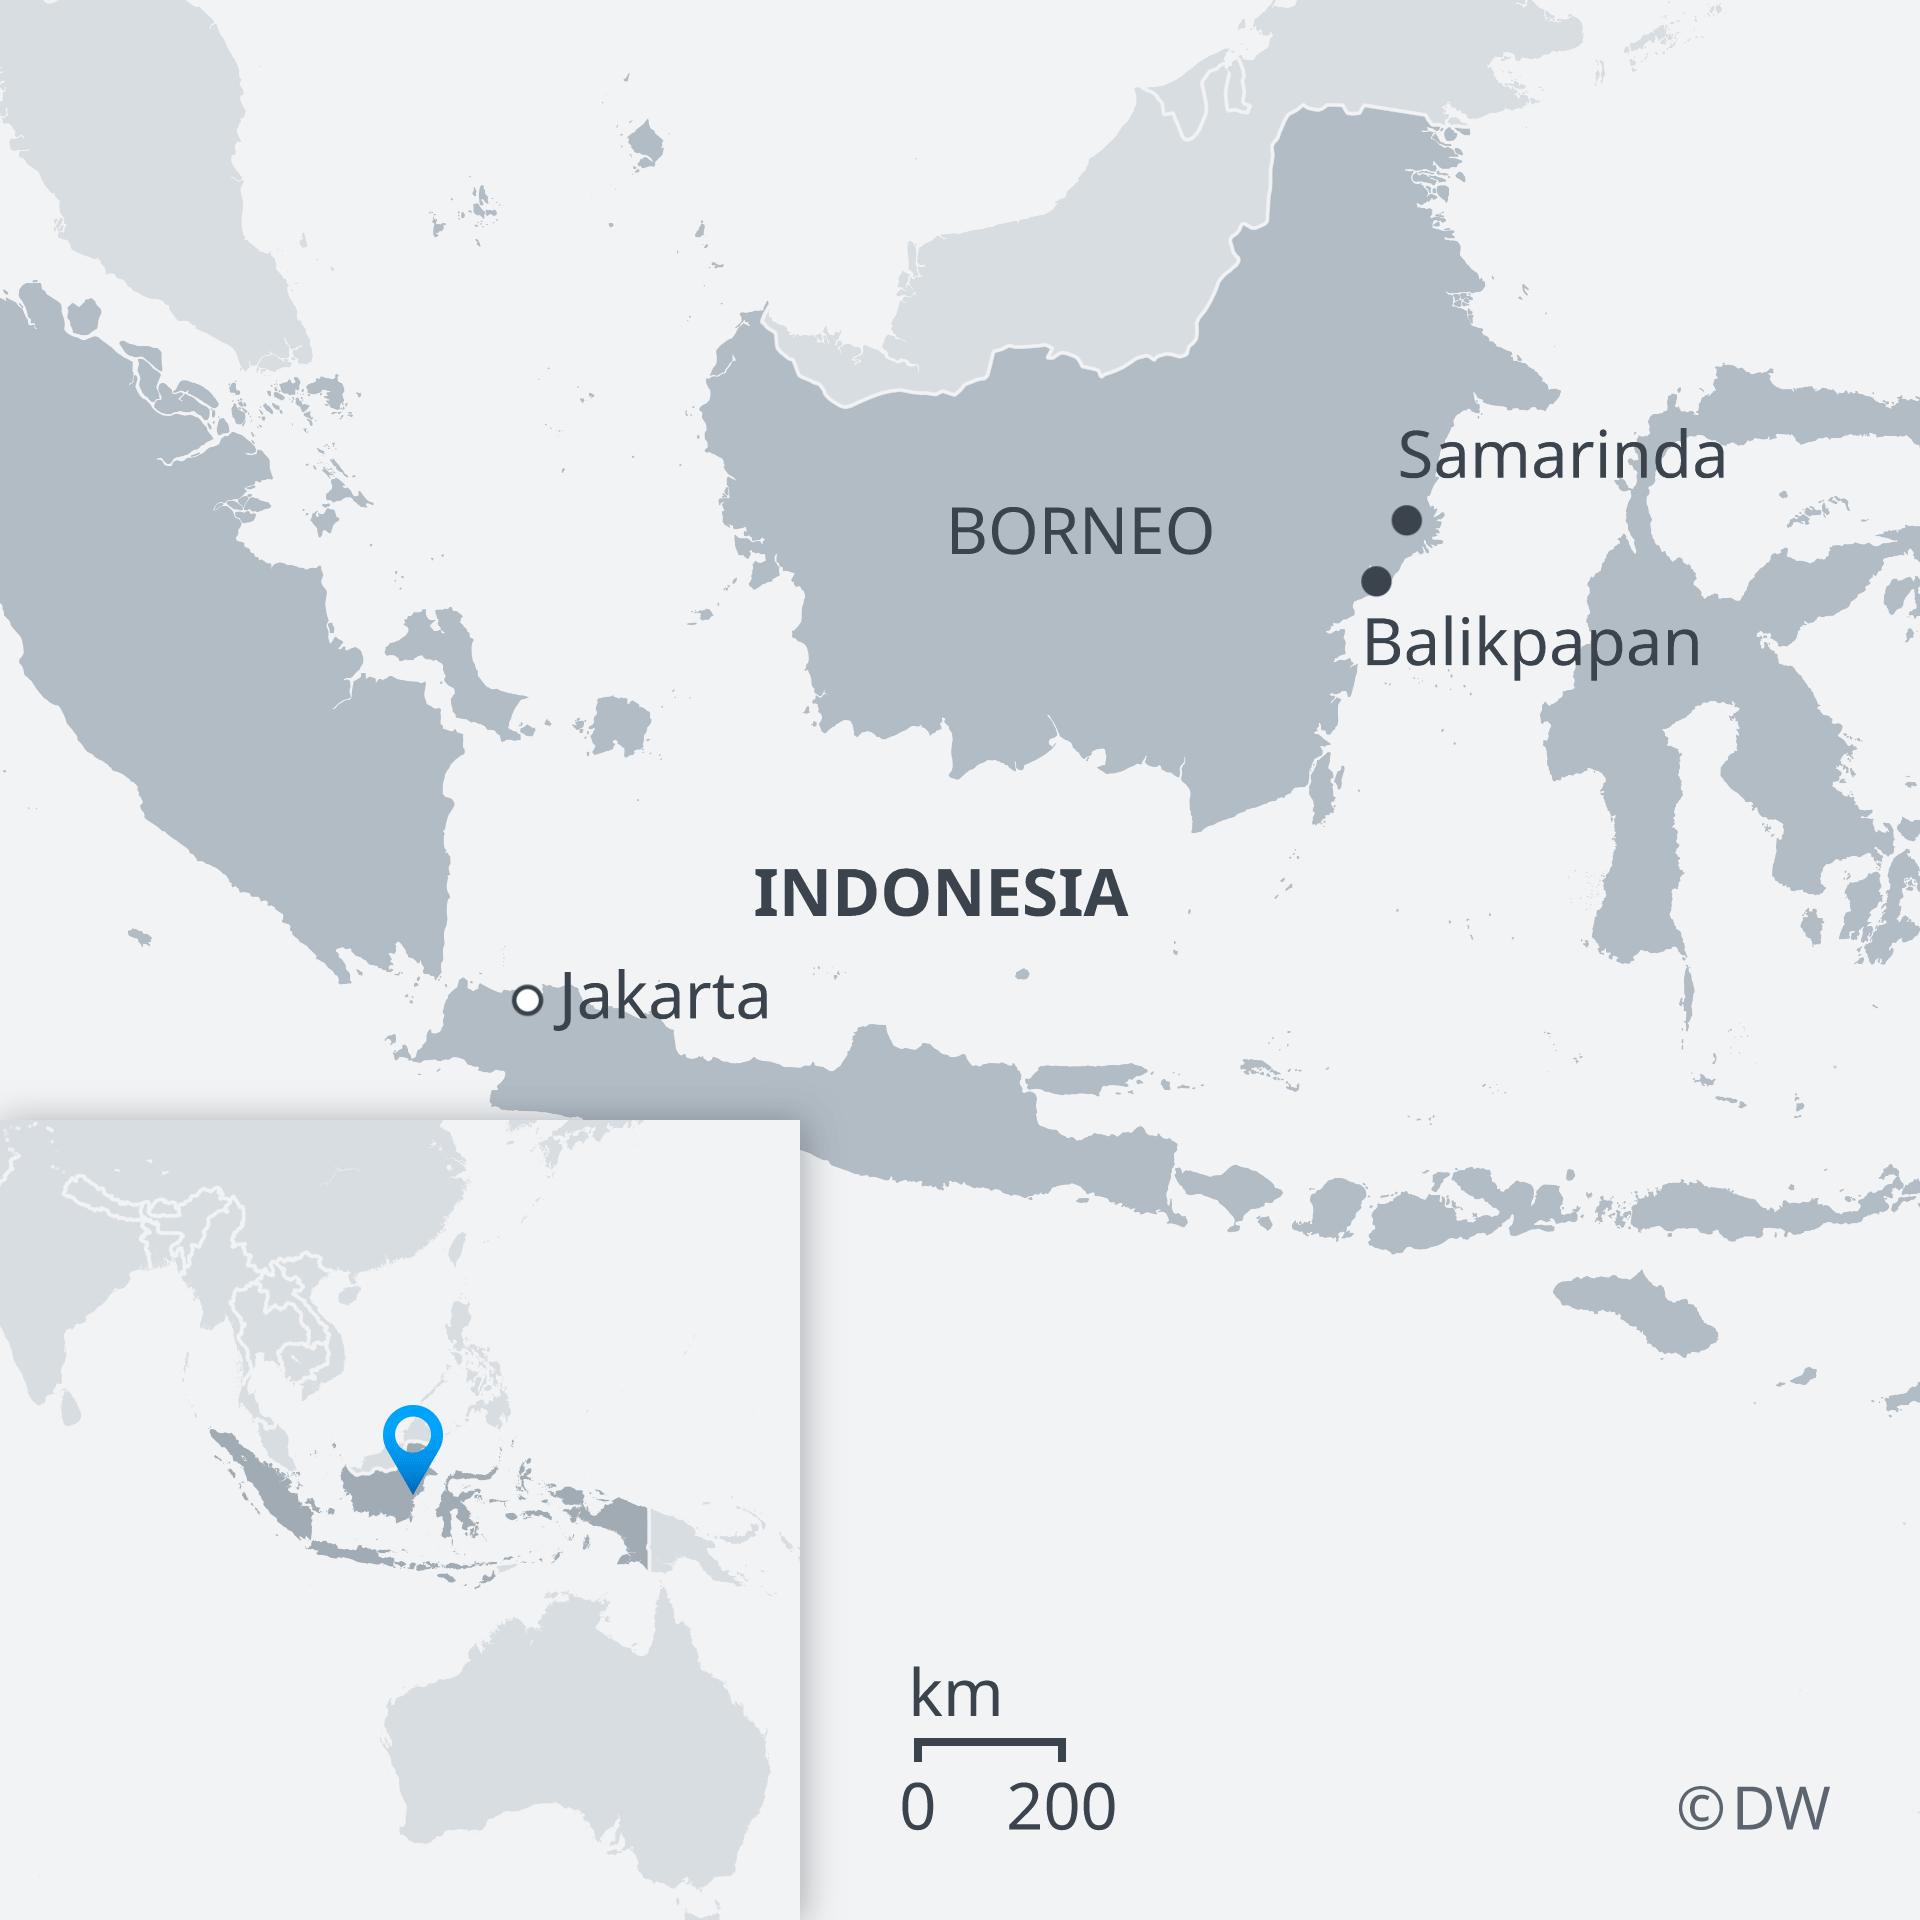 Indonesia Announces Location Of New Capital On Borneo News Dw 26 08 2019